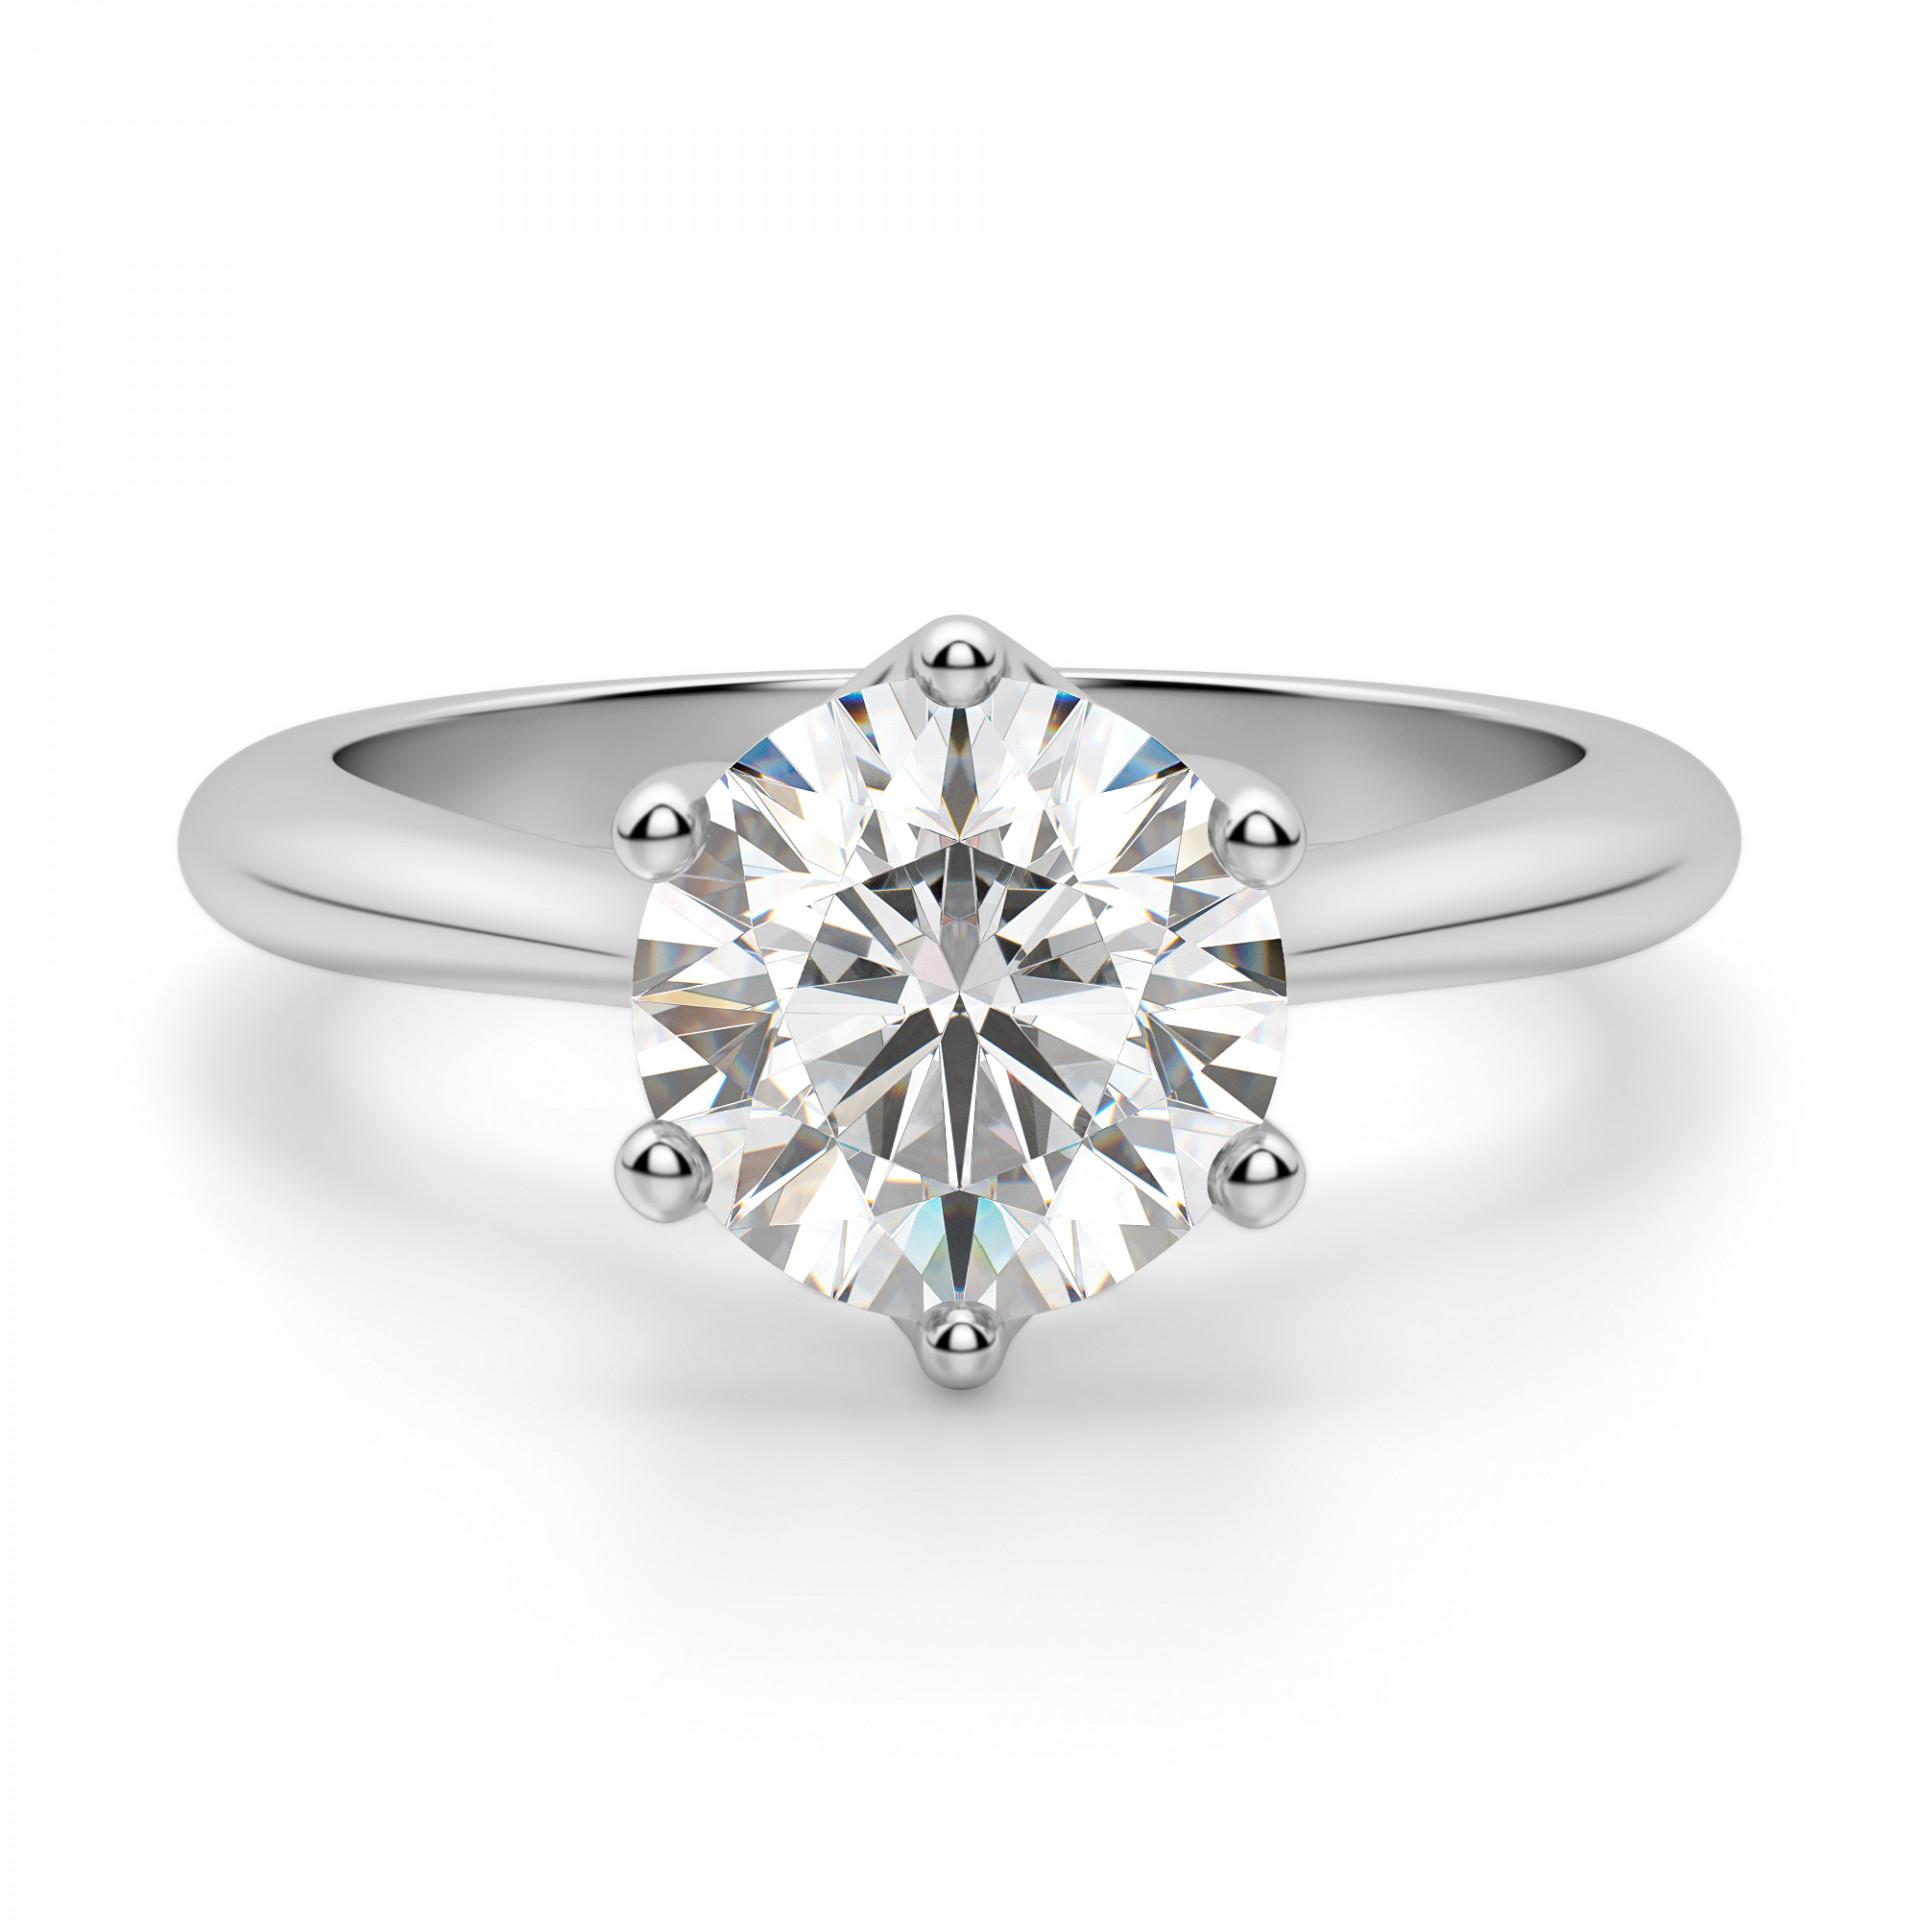 18 Engagement Ring Designs Your Honey Won't Resist